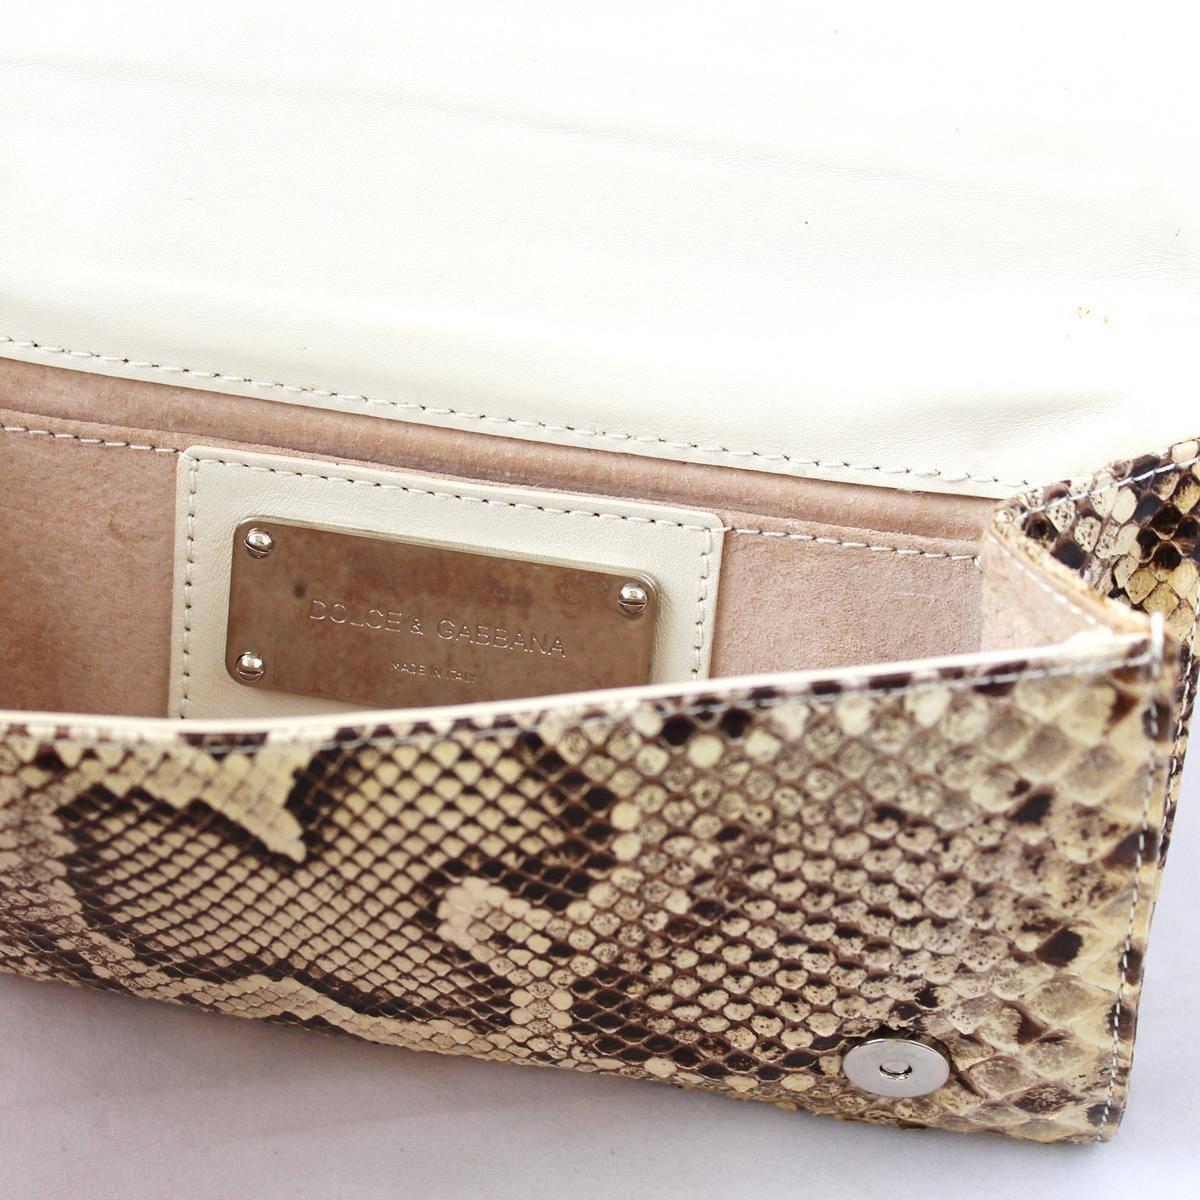 Dolce and Gabbana Reptile Pochette For Sale at 1stdibs 0df7ecc4d8a